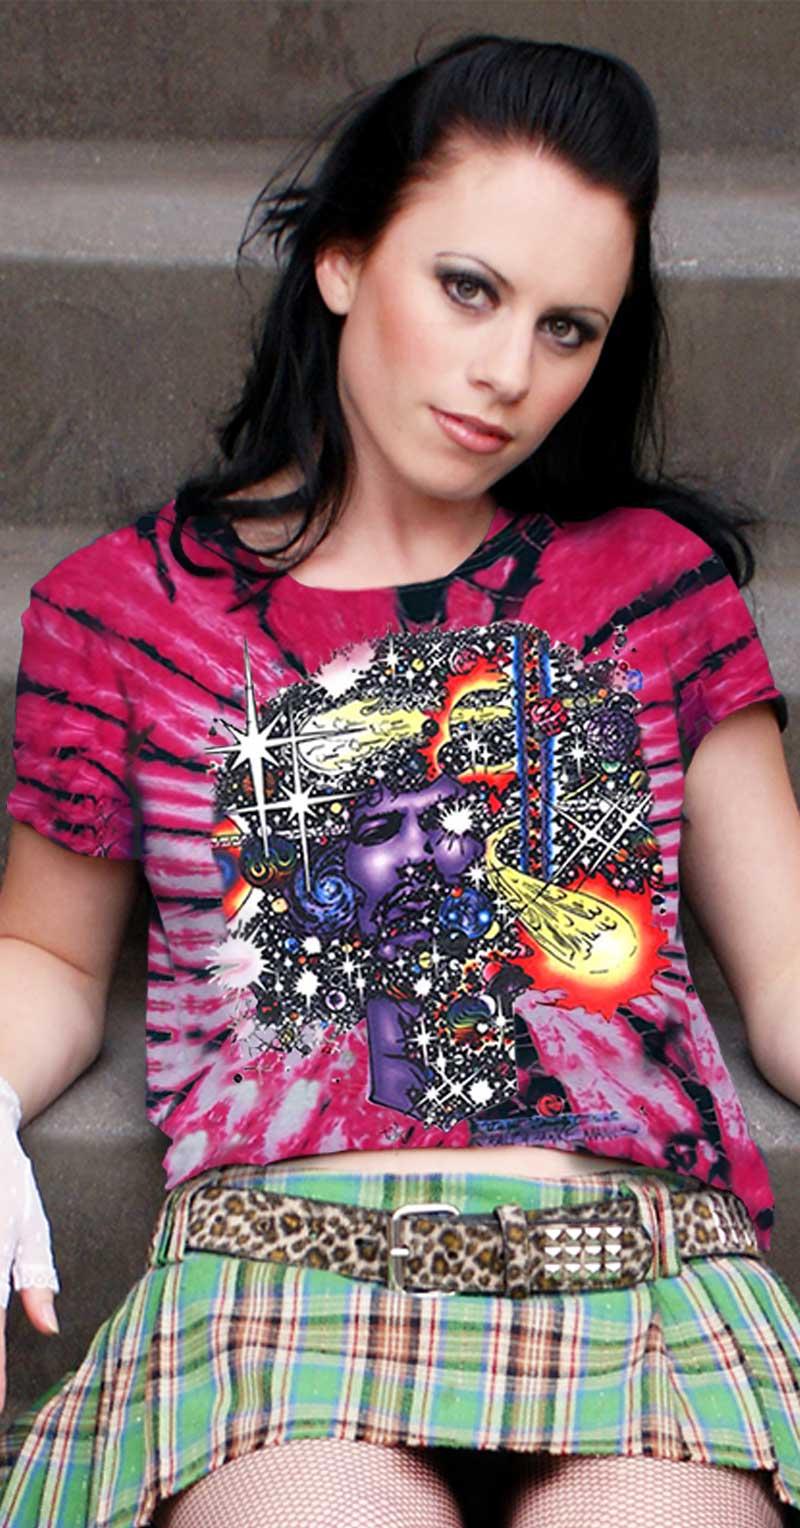 Jimi Hendrix T-shirt Ladies Inspired Haze - Women's pink tie dye, 100% cotton crew neck cut, short sleeve tee.